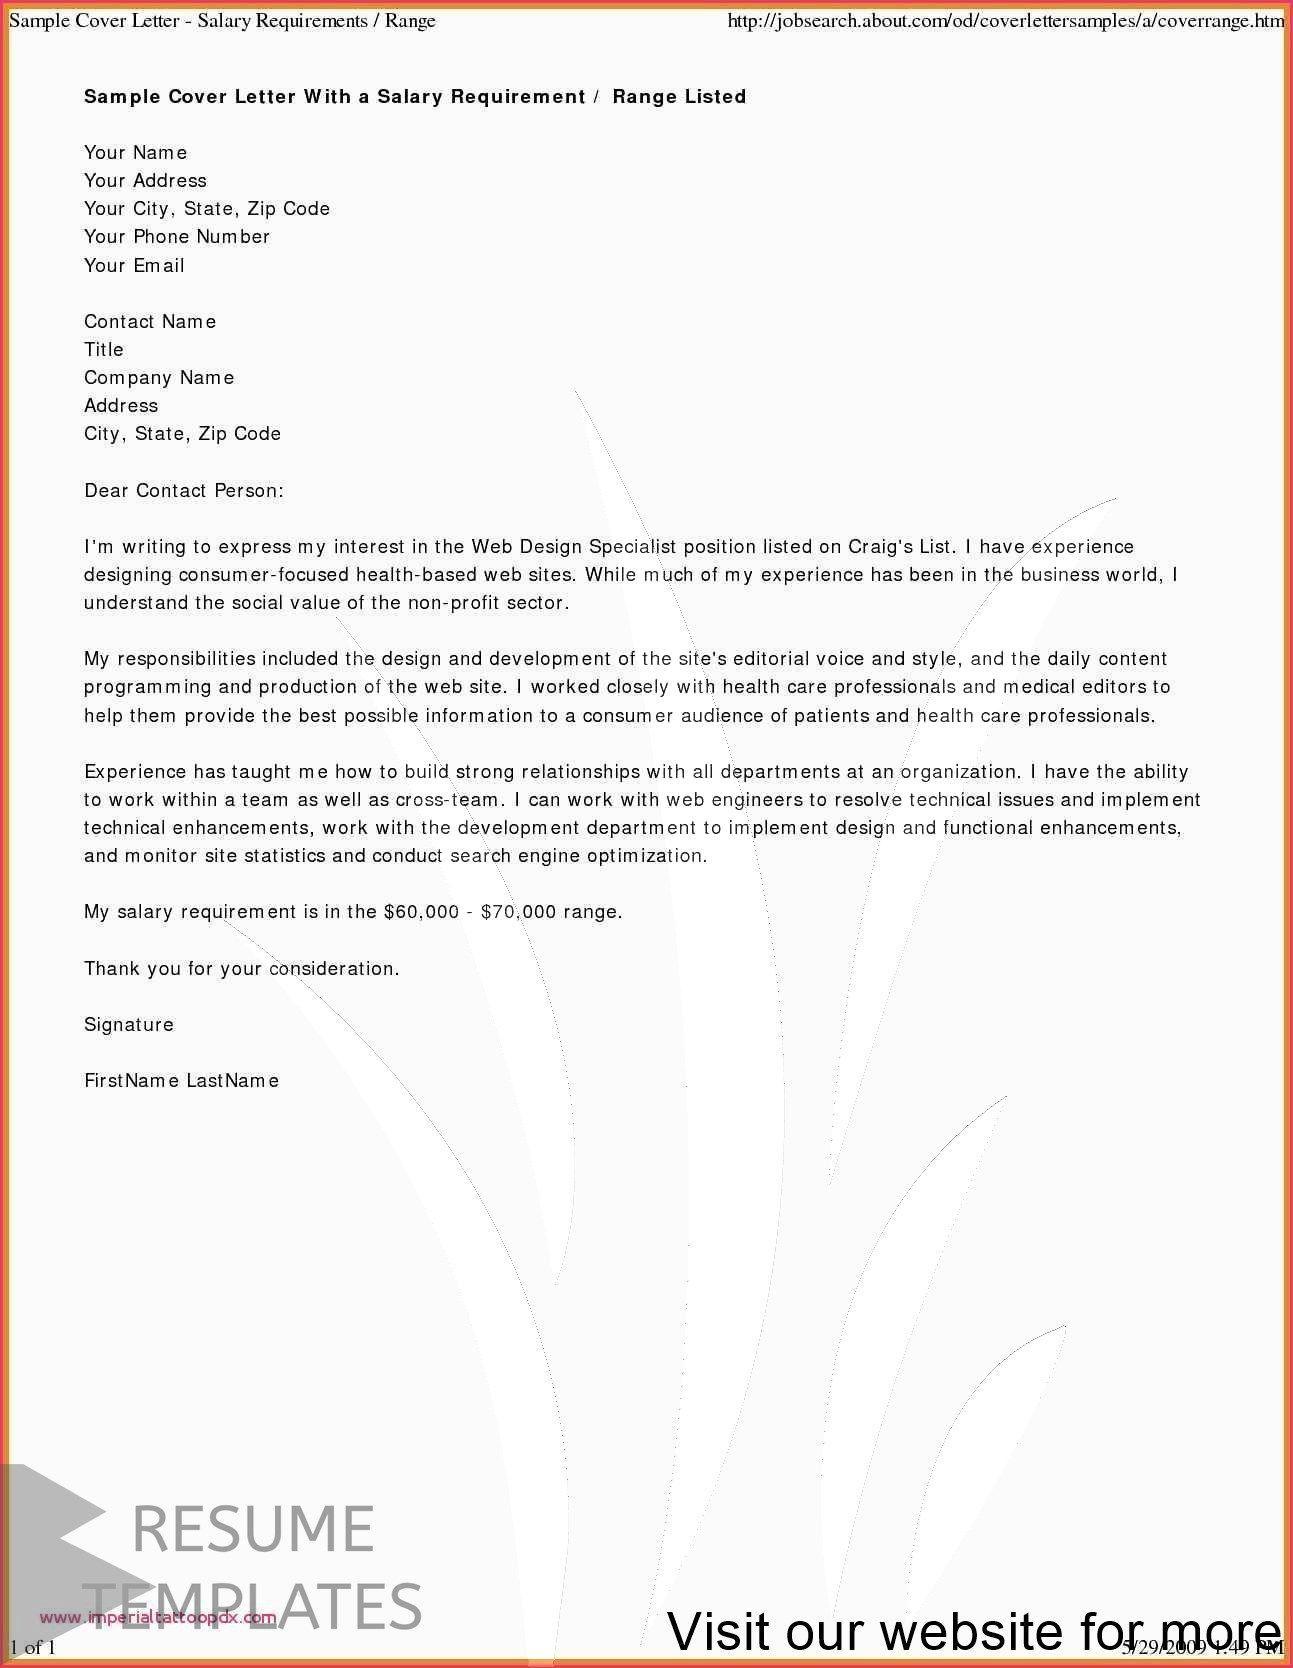 Resume Builder Free Download Australia